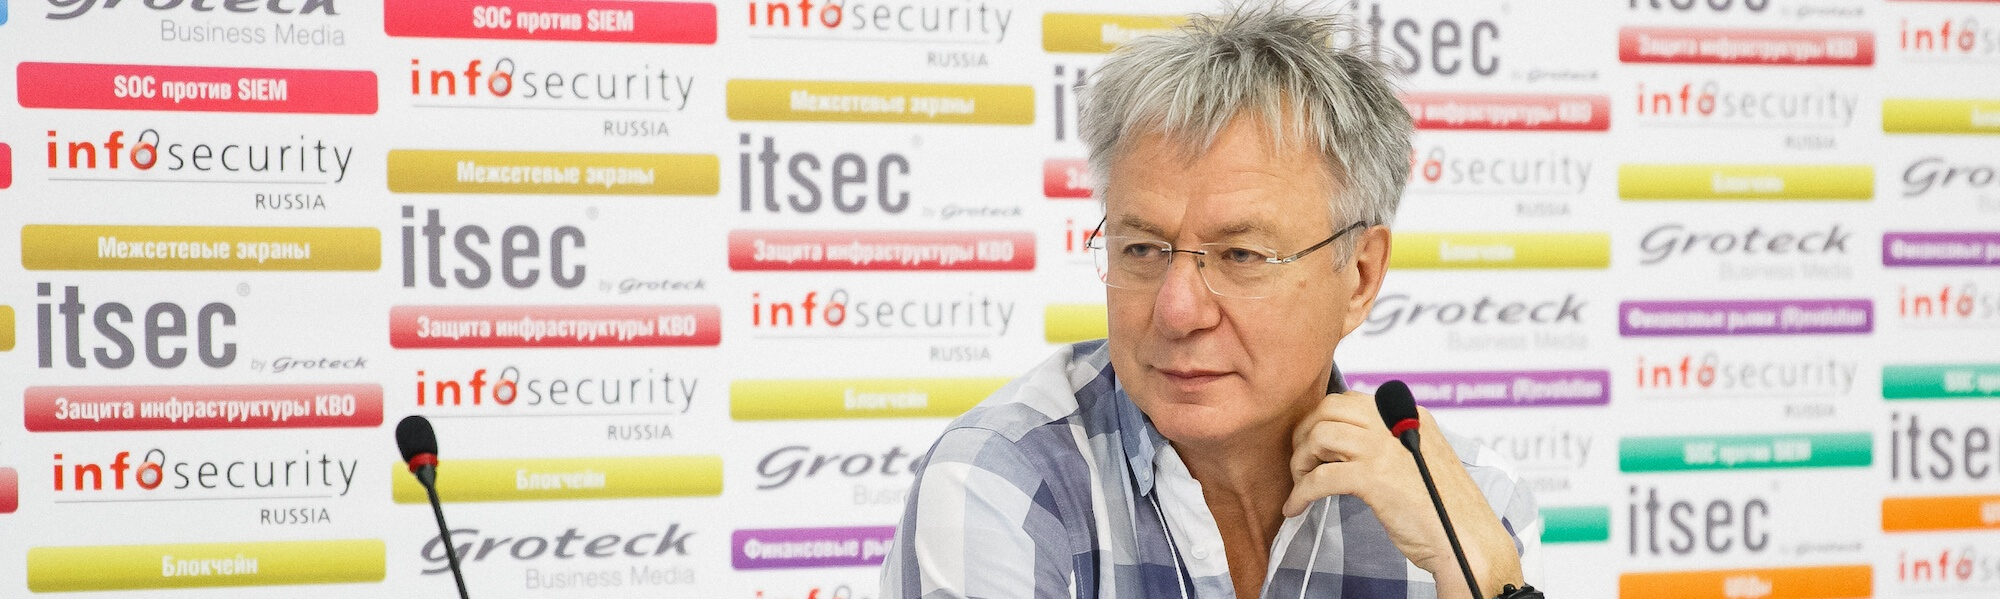 Alexander Galitskiy